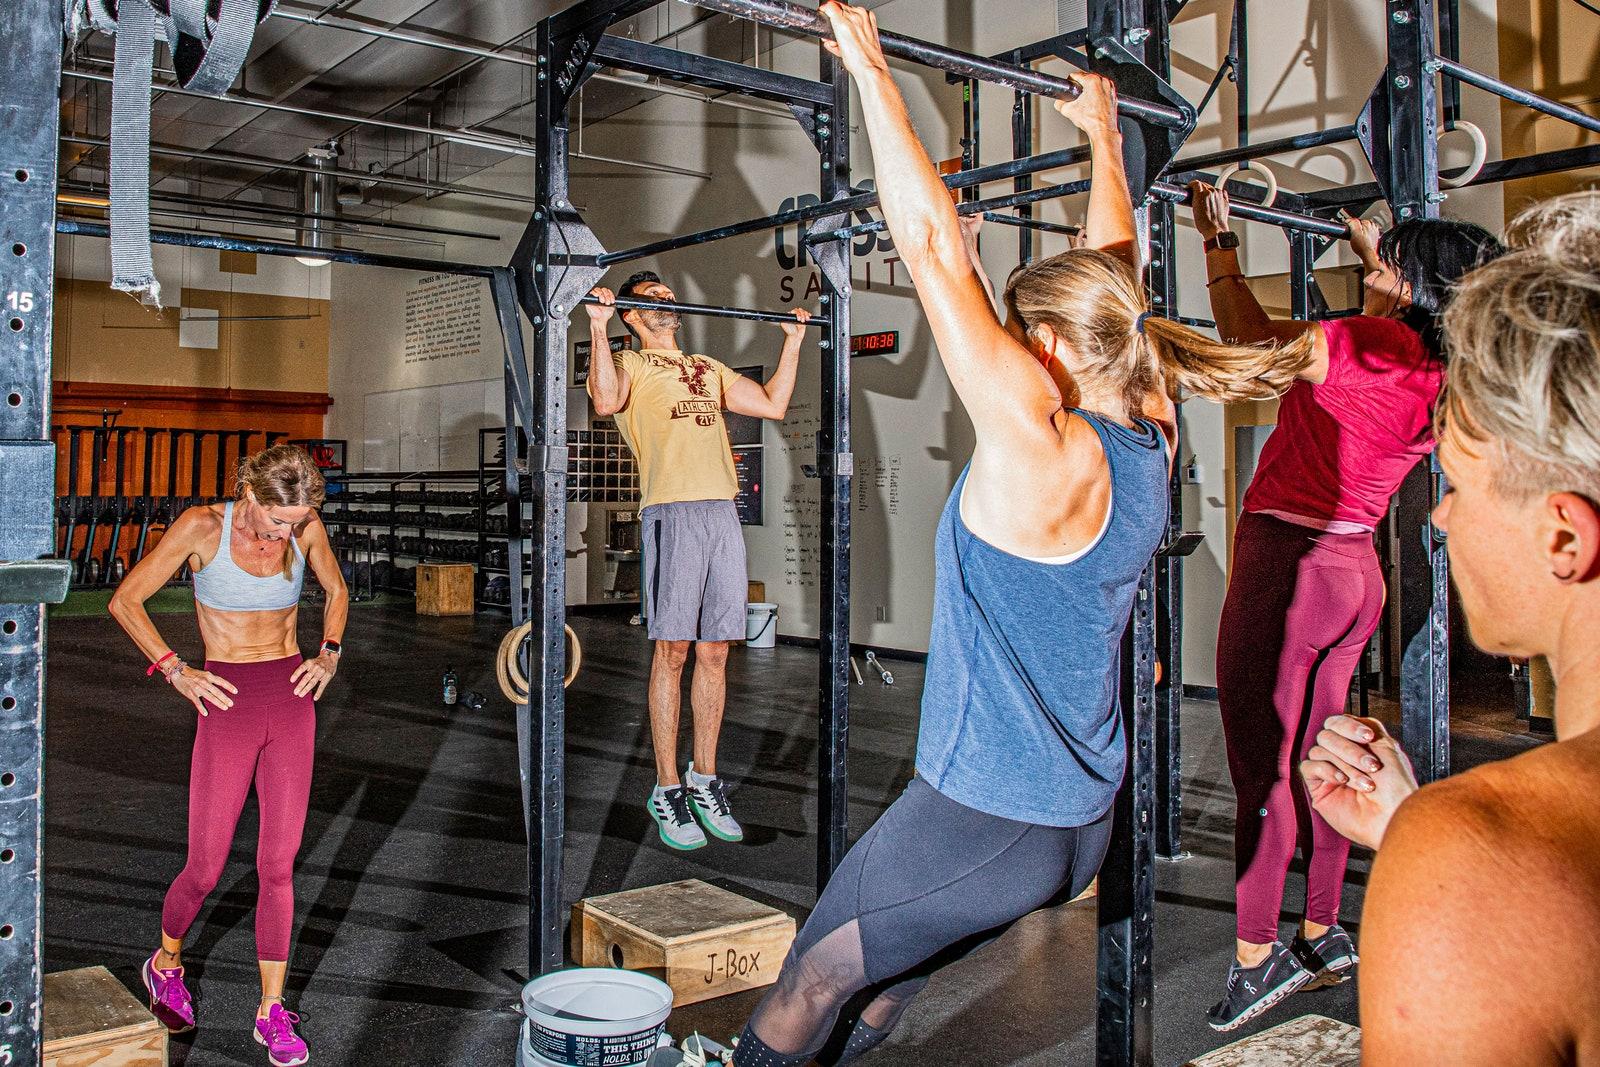 A group trains at CrossFit Sanitas in Boulder Colorado.